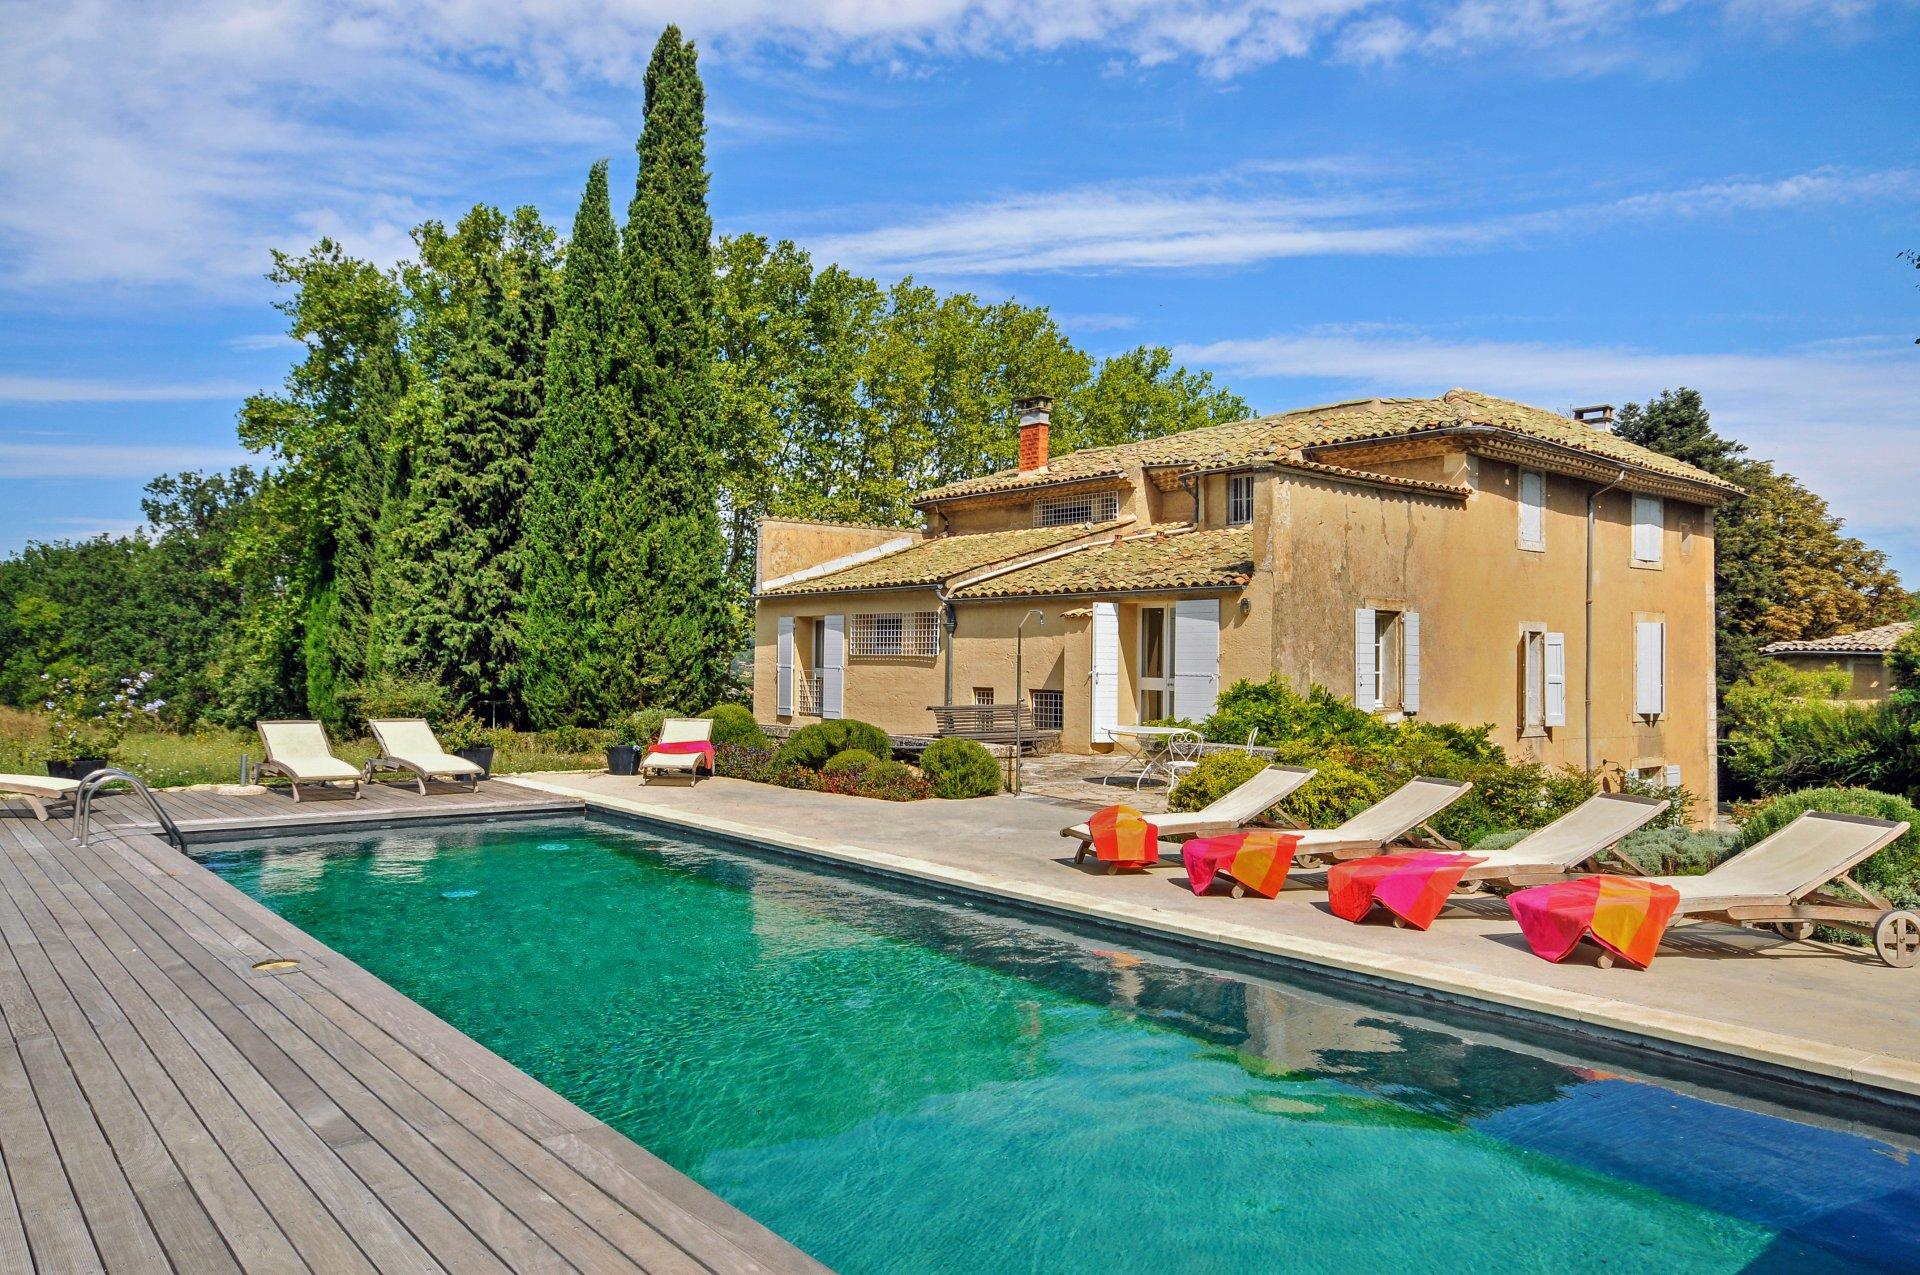 Outdoor Pool 1, Grand Luberon, Apt, Provence.